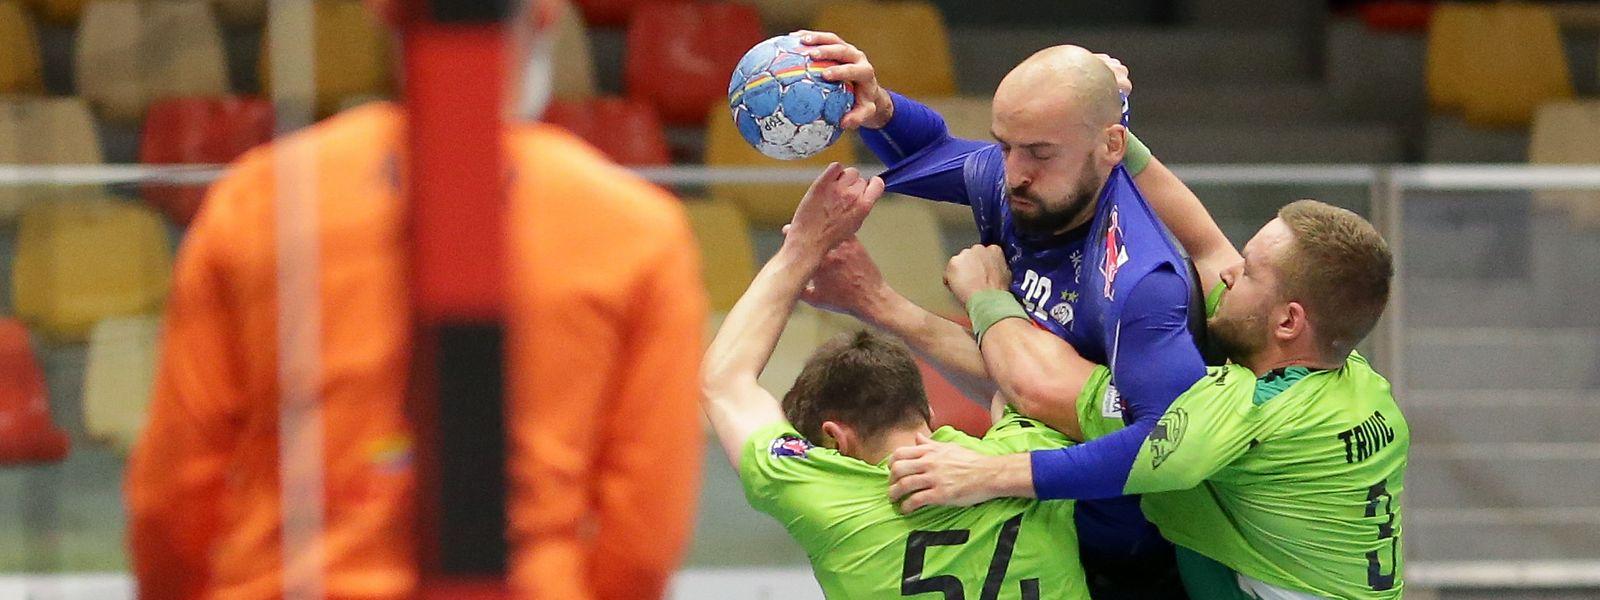 Düdelingens Neuzugang Boris Becirovic (am Ball), hier gegen Käerjengs Miroslav Rac und Milasin Trivic (r.), erzielt den erlösenden Siegtreffer.